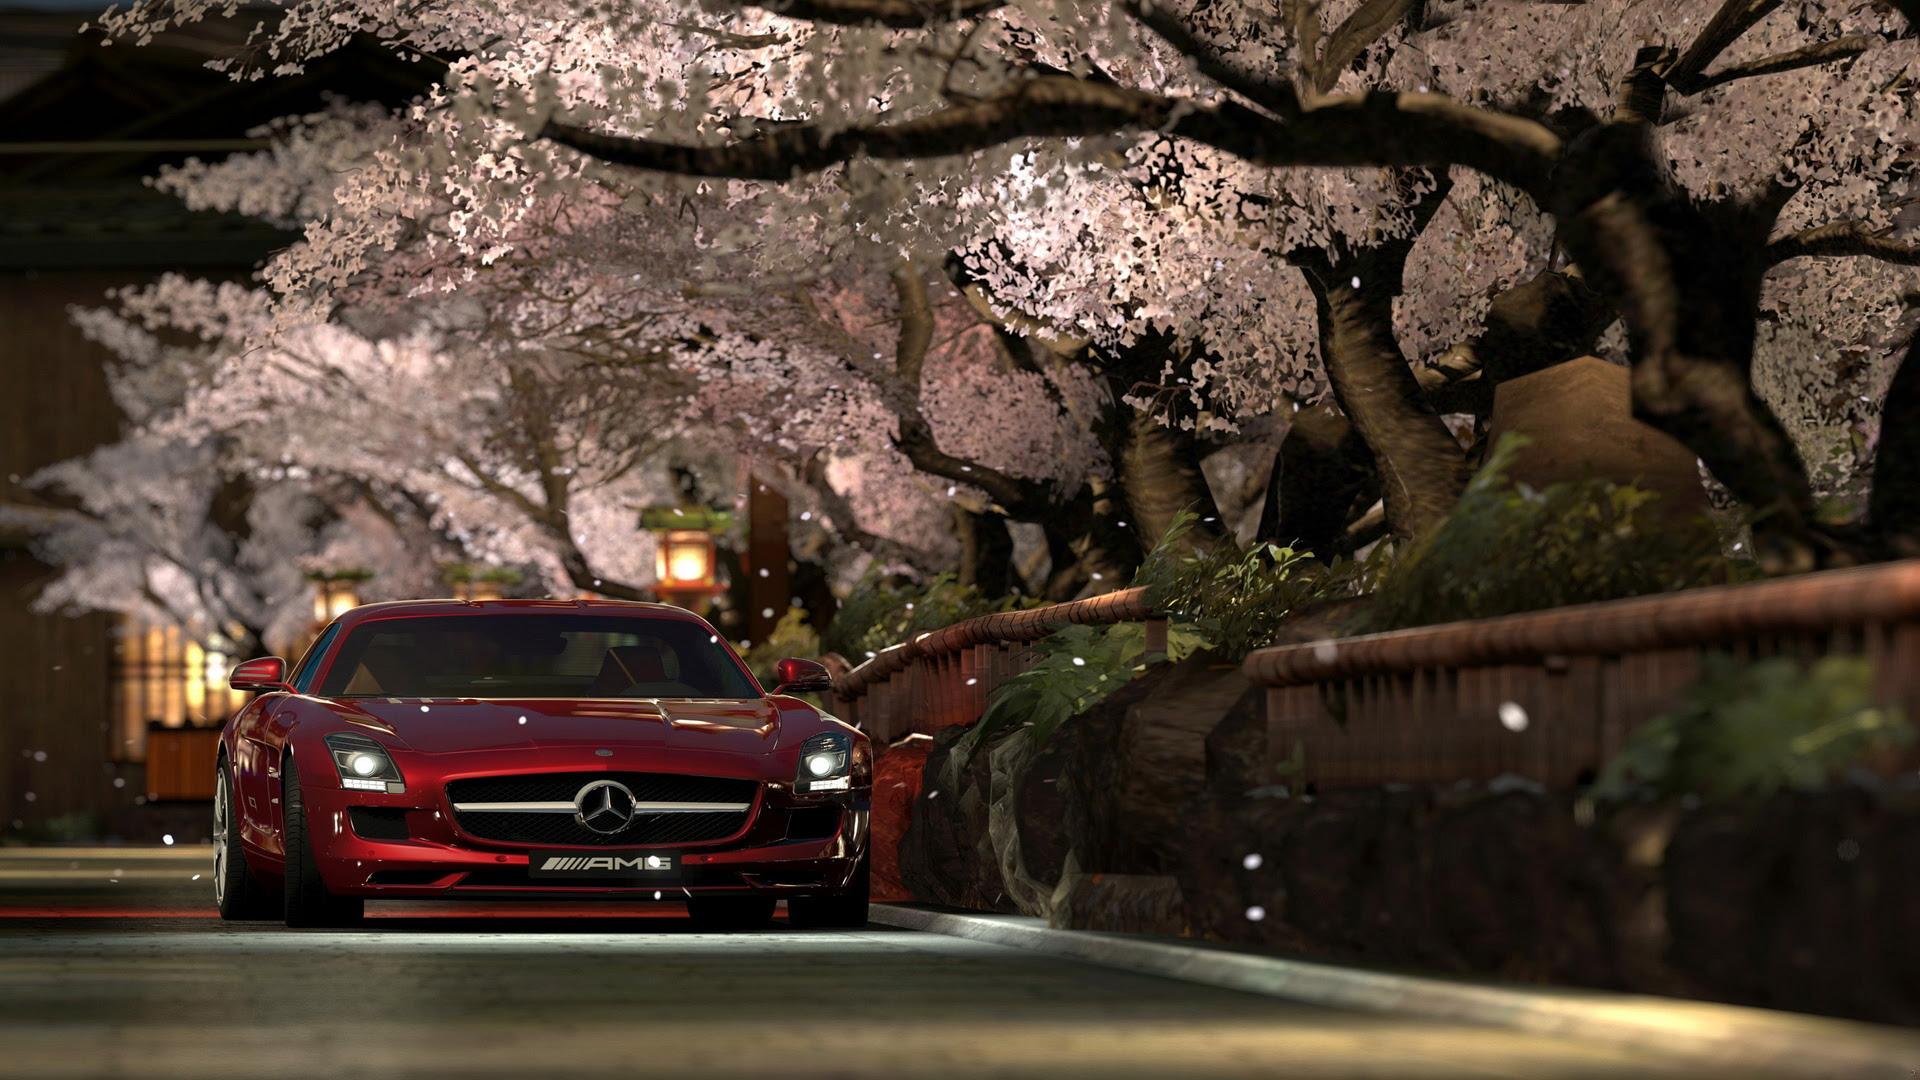 1080P Car Wallpaper HD  PixelsTalk.Net